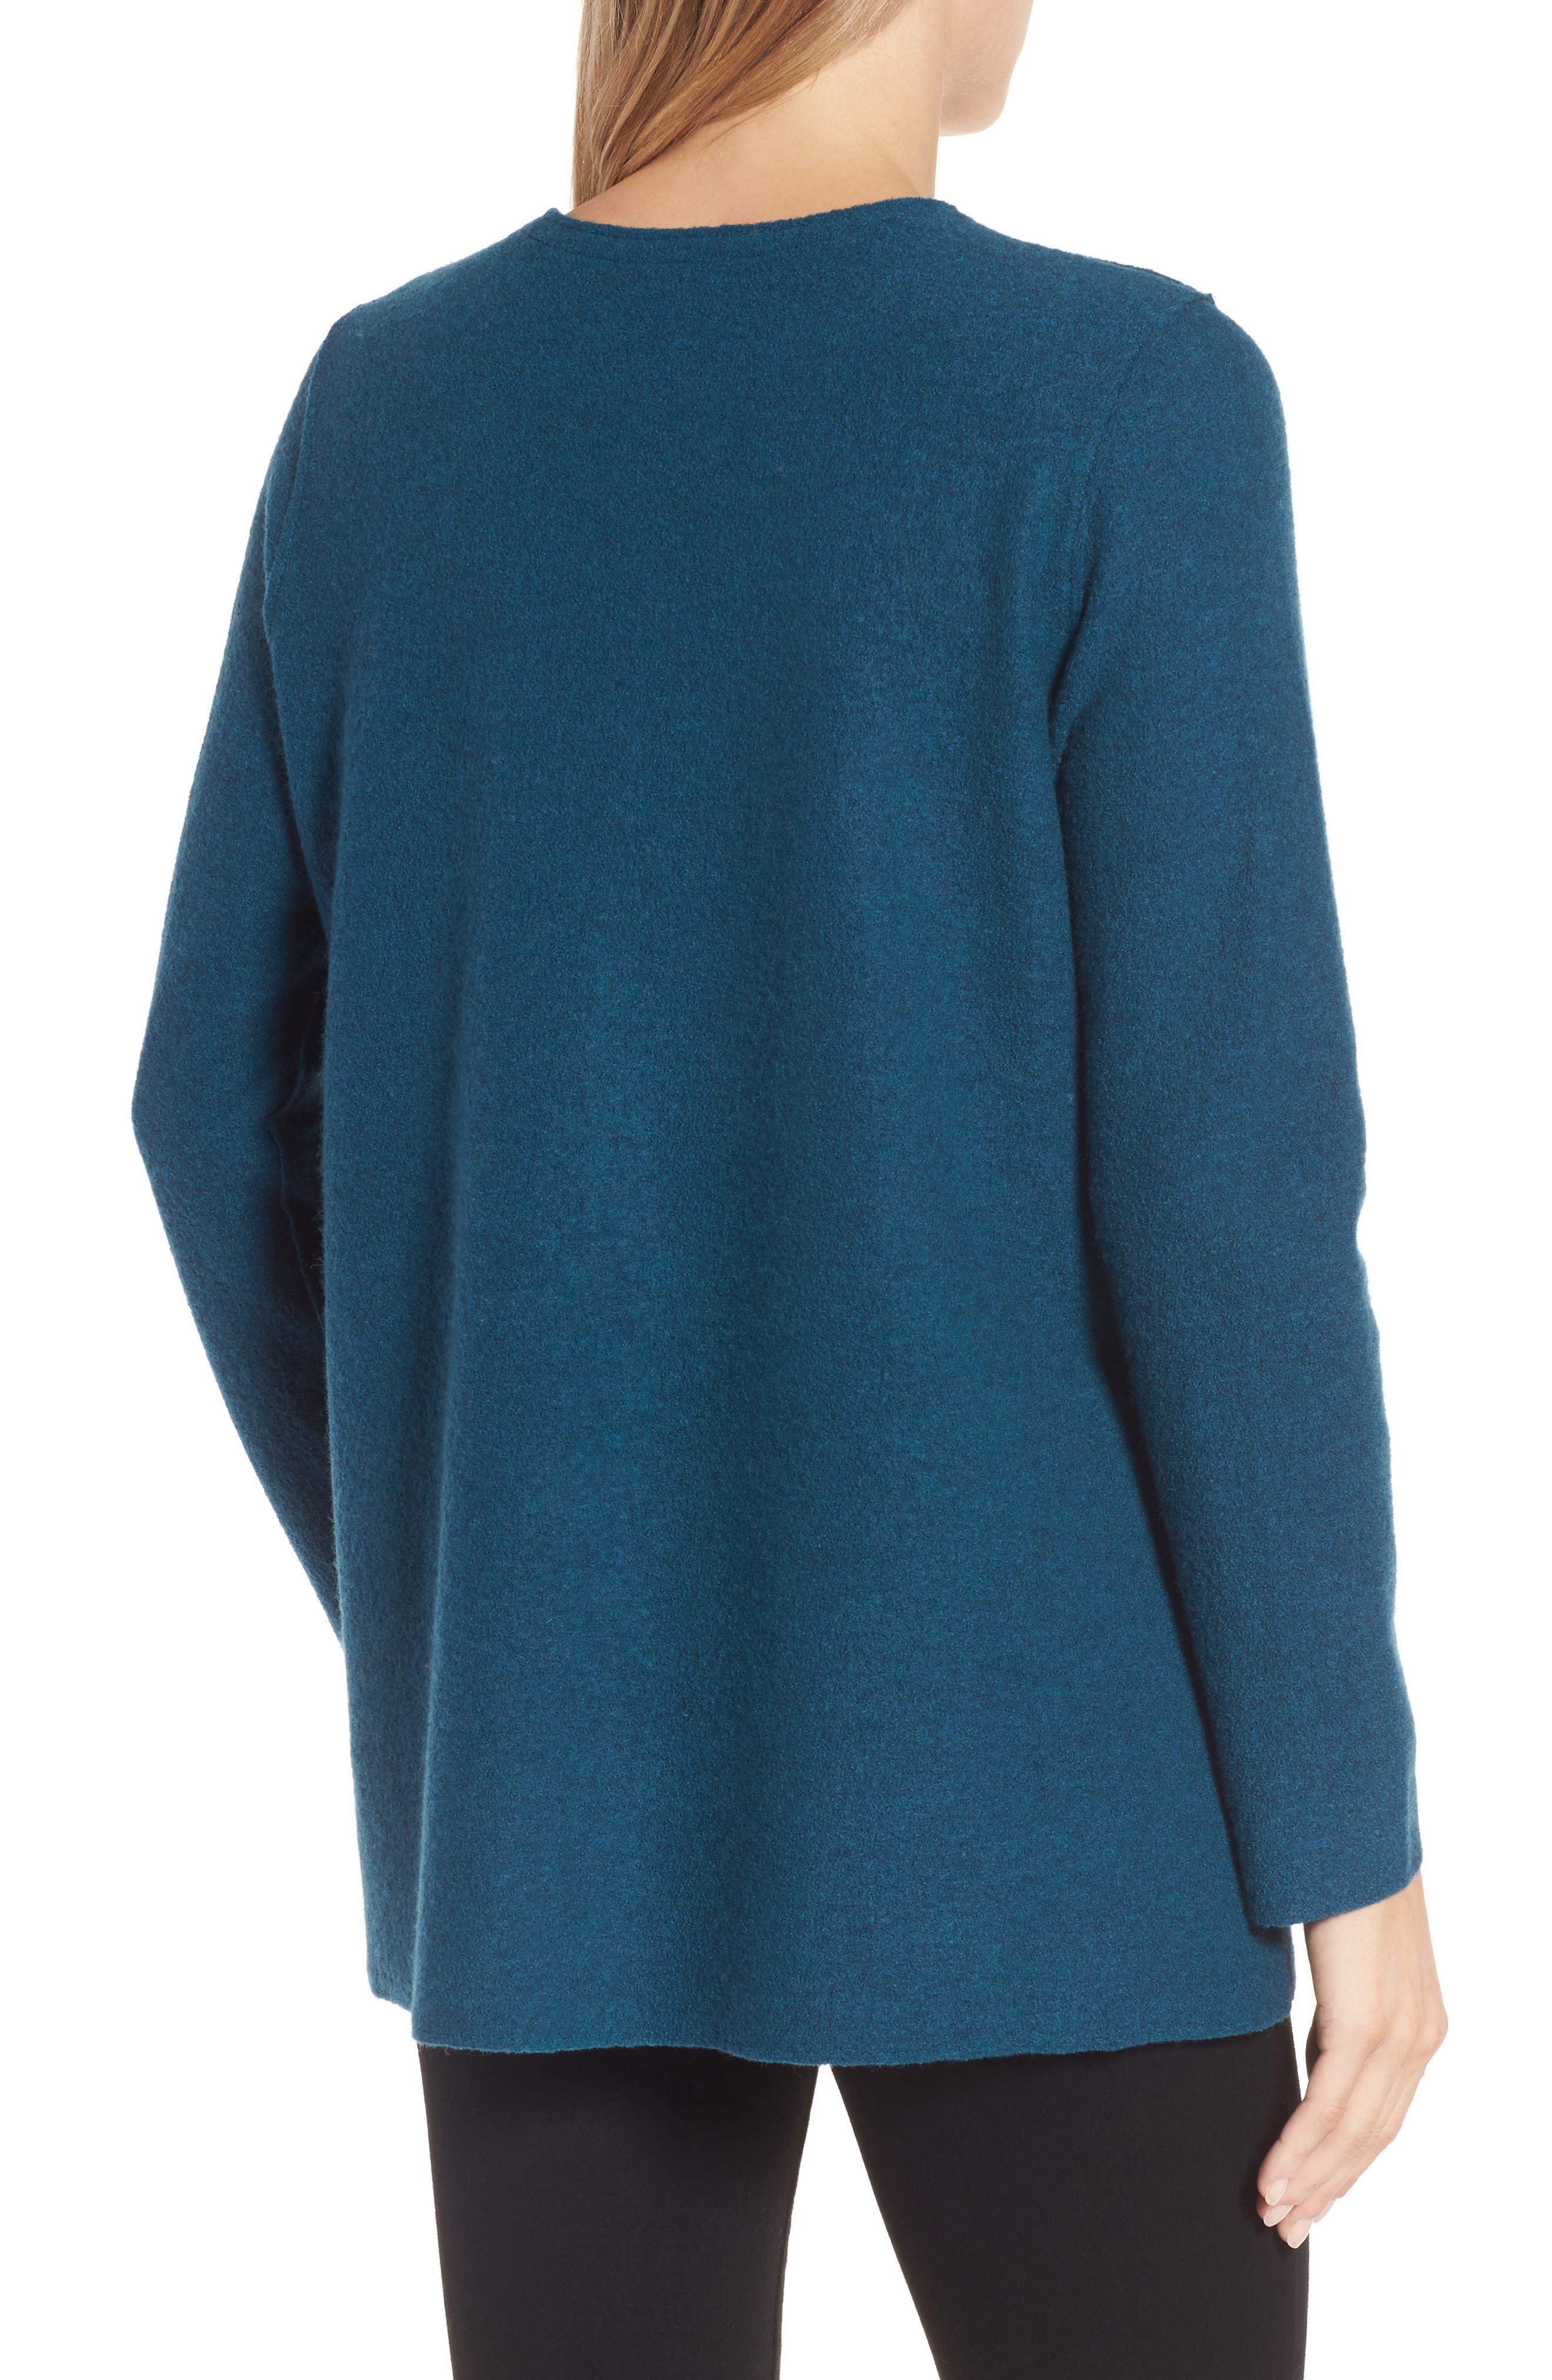 Boiled Merino Wool Top,                             Alternate thumbnail 2, color,                             Blue Spruce